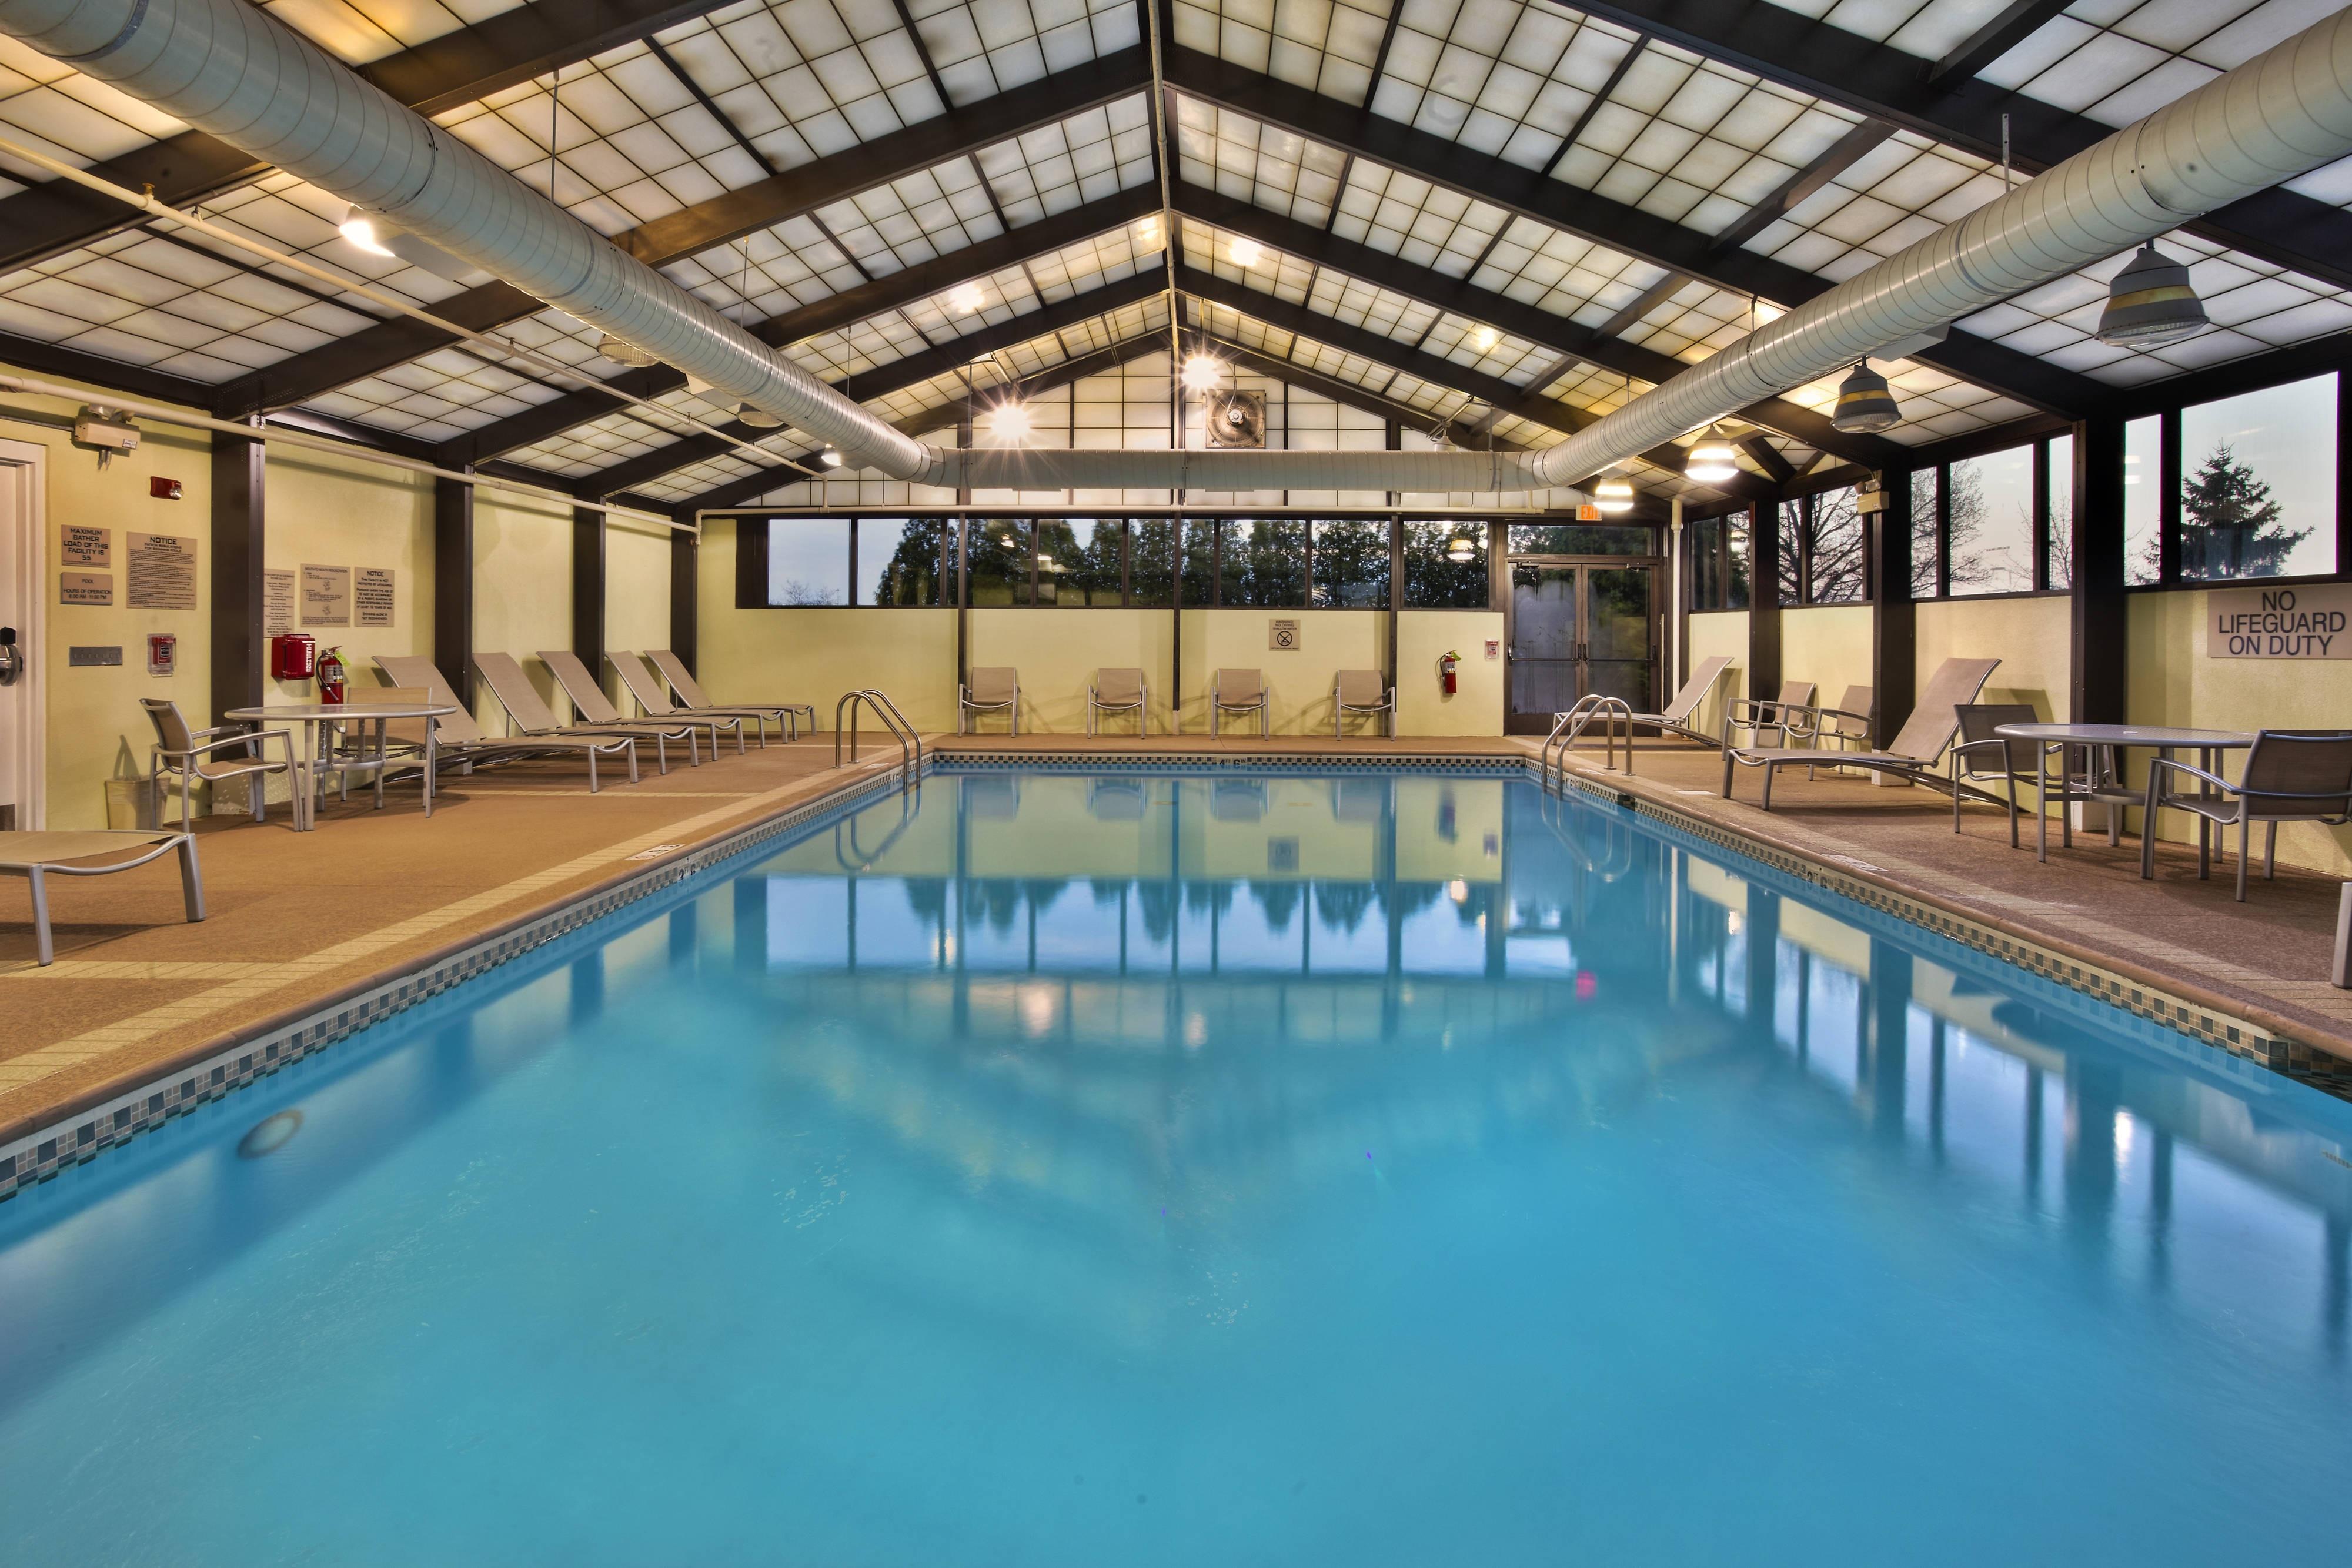 SpringHill Suites Chicago Southwest at Burr Ridge/Hinsdale Indoor Pool